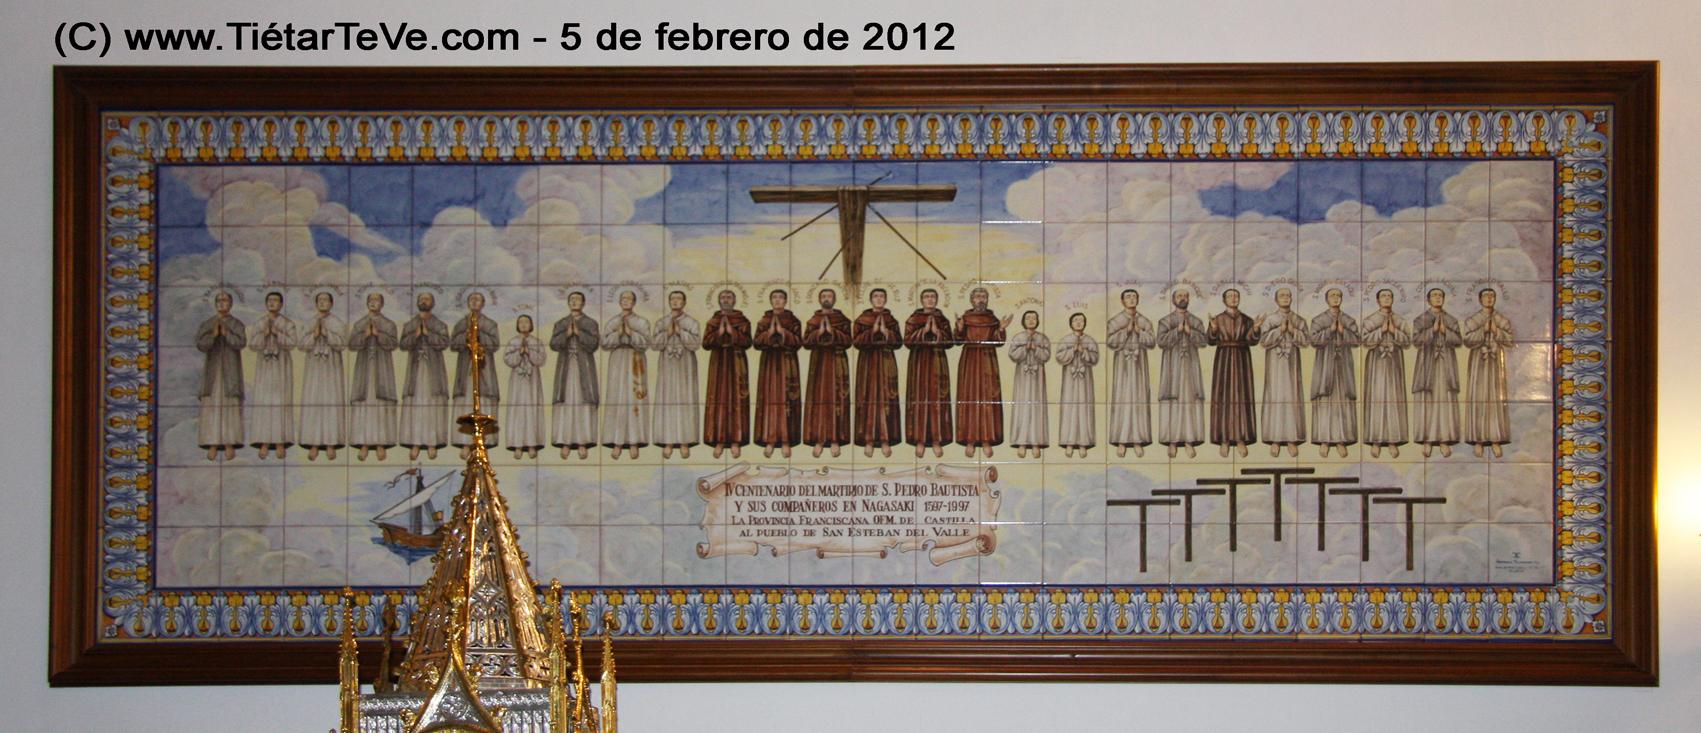 El Vítor de San Esteban del Valle - TiétarTeVe.com